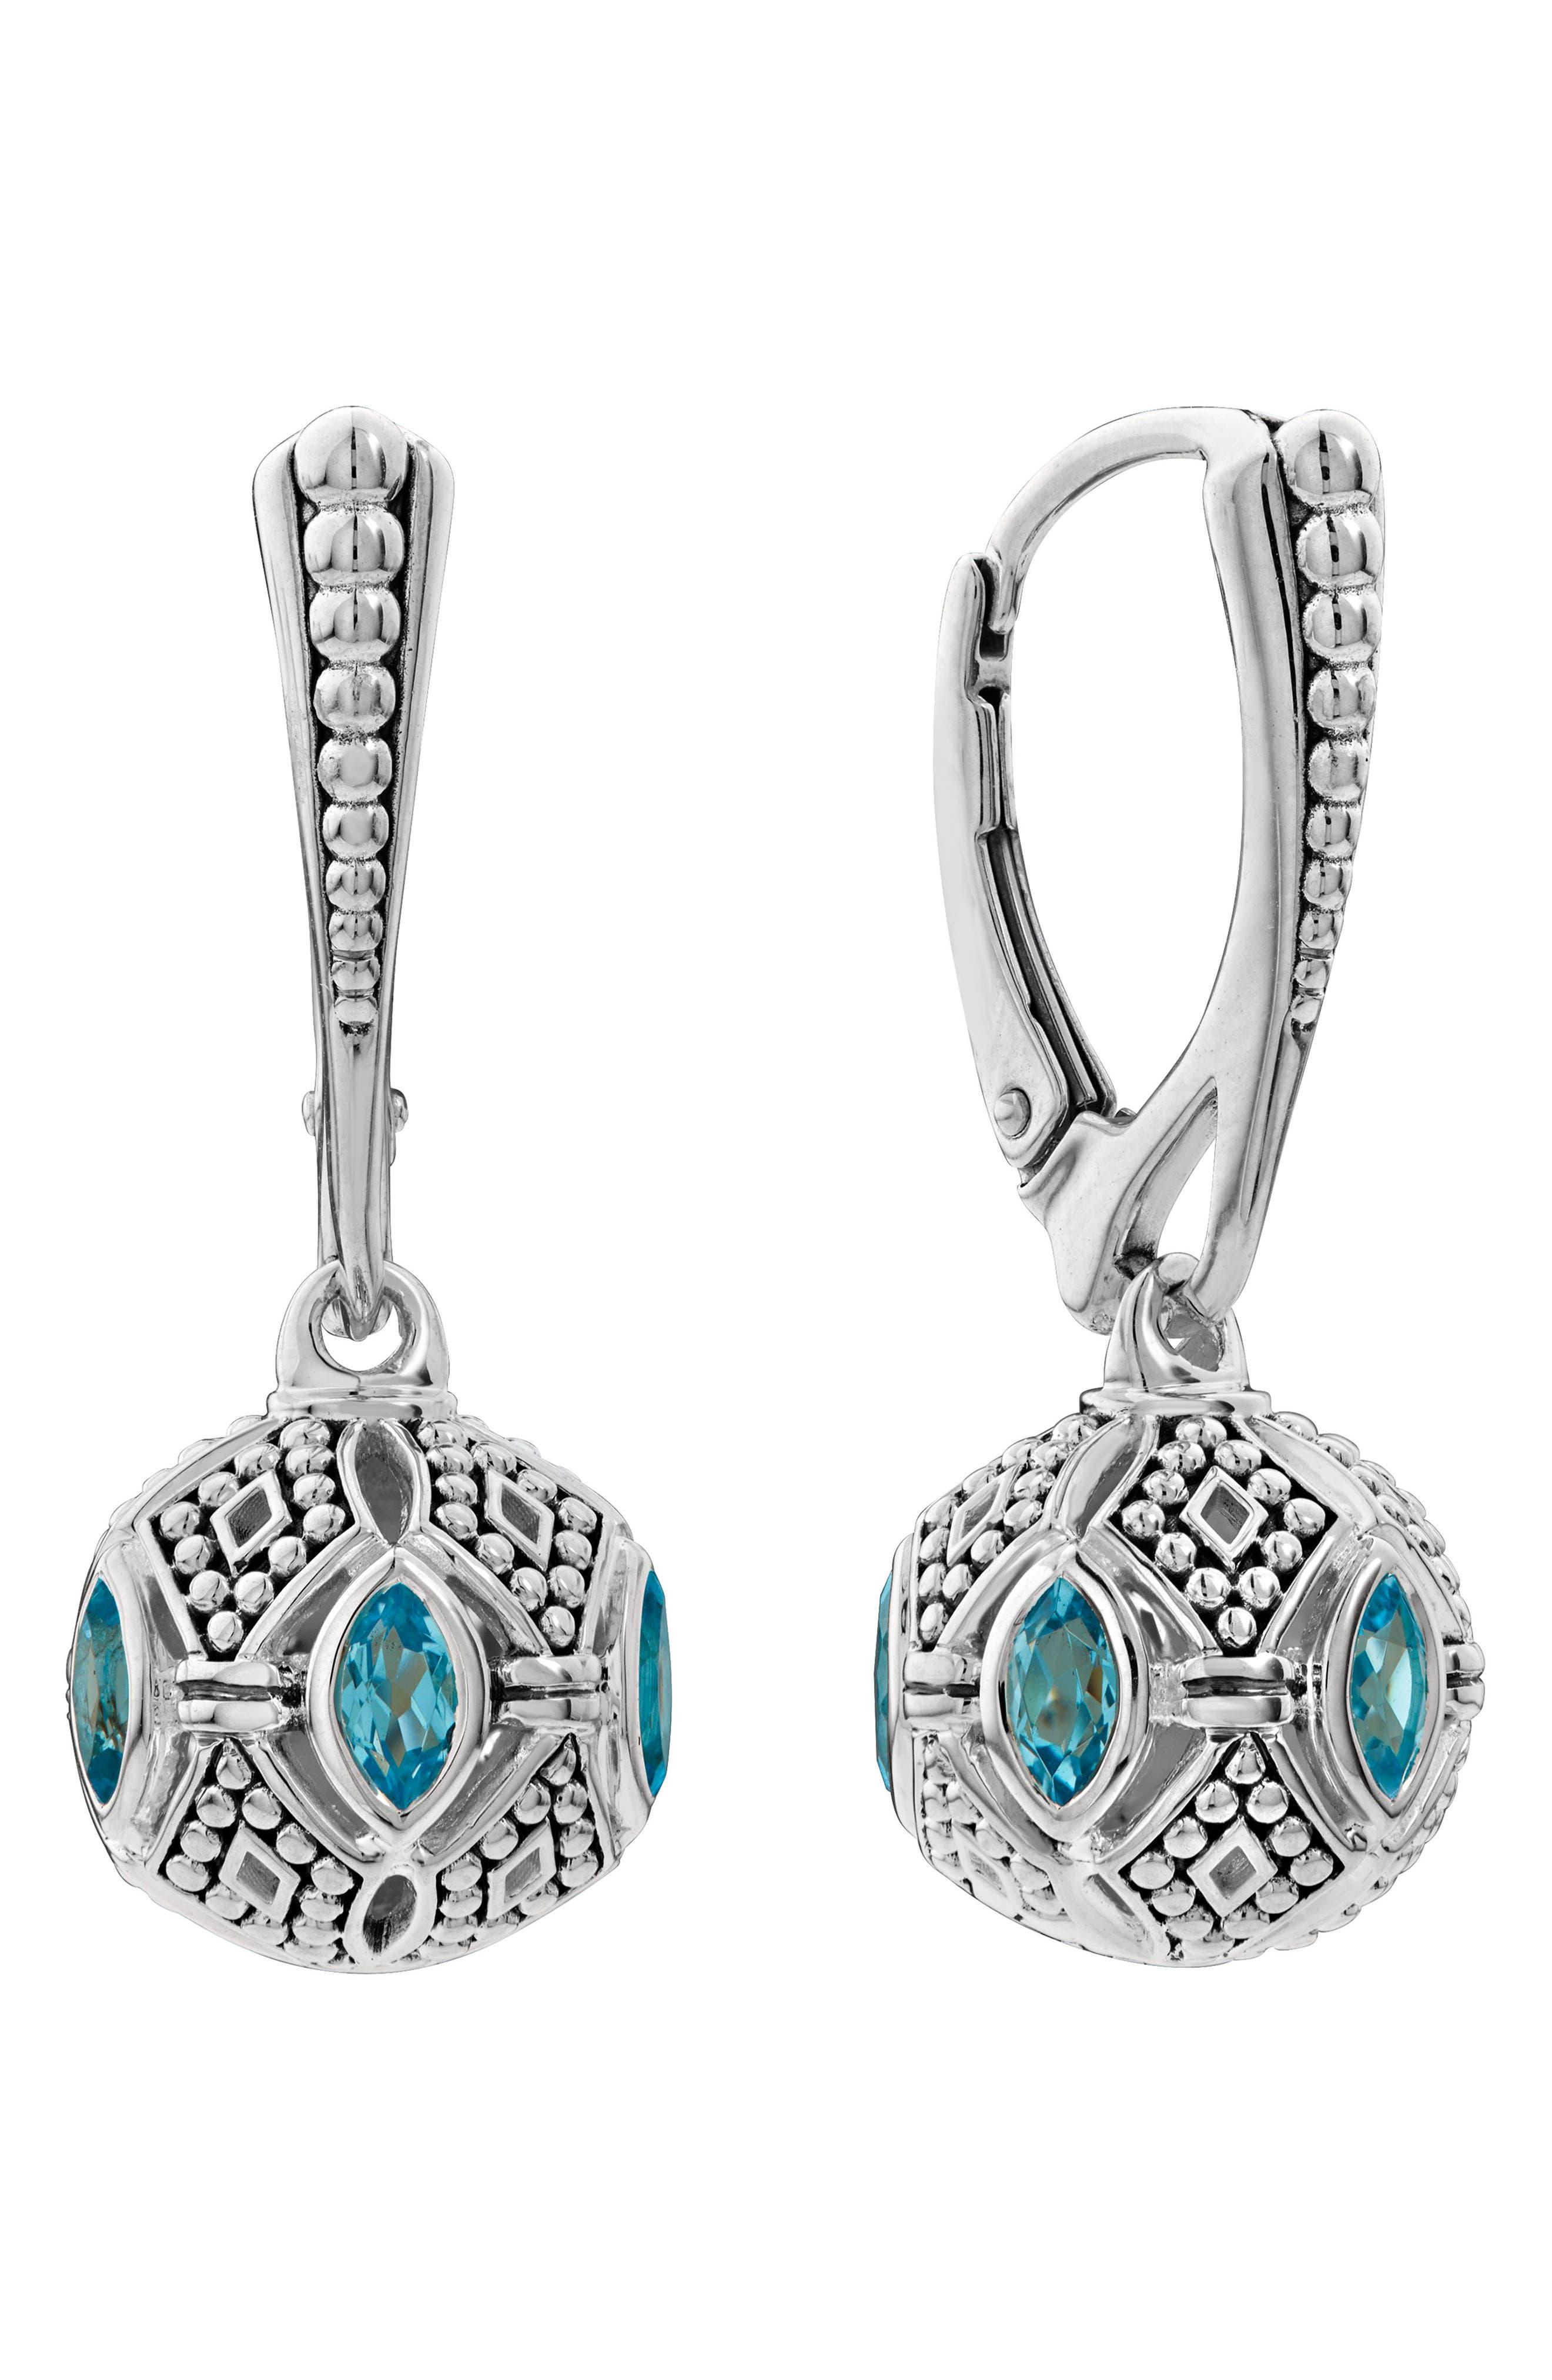 Caviar Talisman Marquee Leverback Earrings,                         Main,                         color, Silver/ 18K Gold/ Blue Topaz